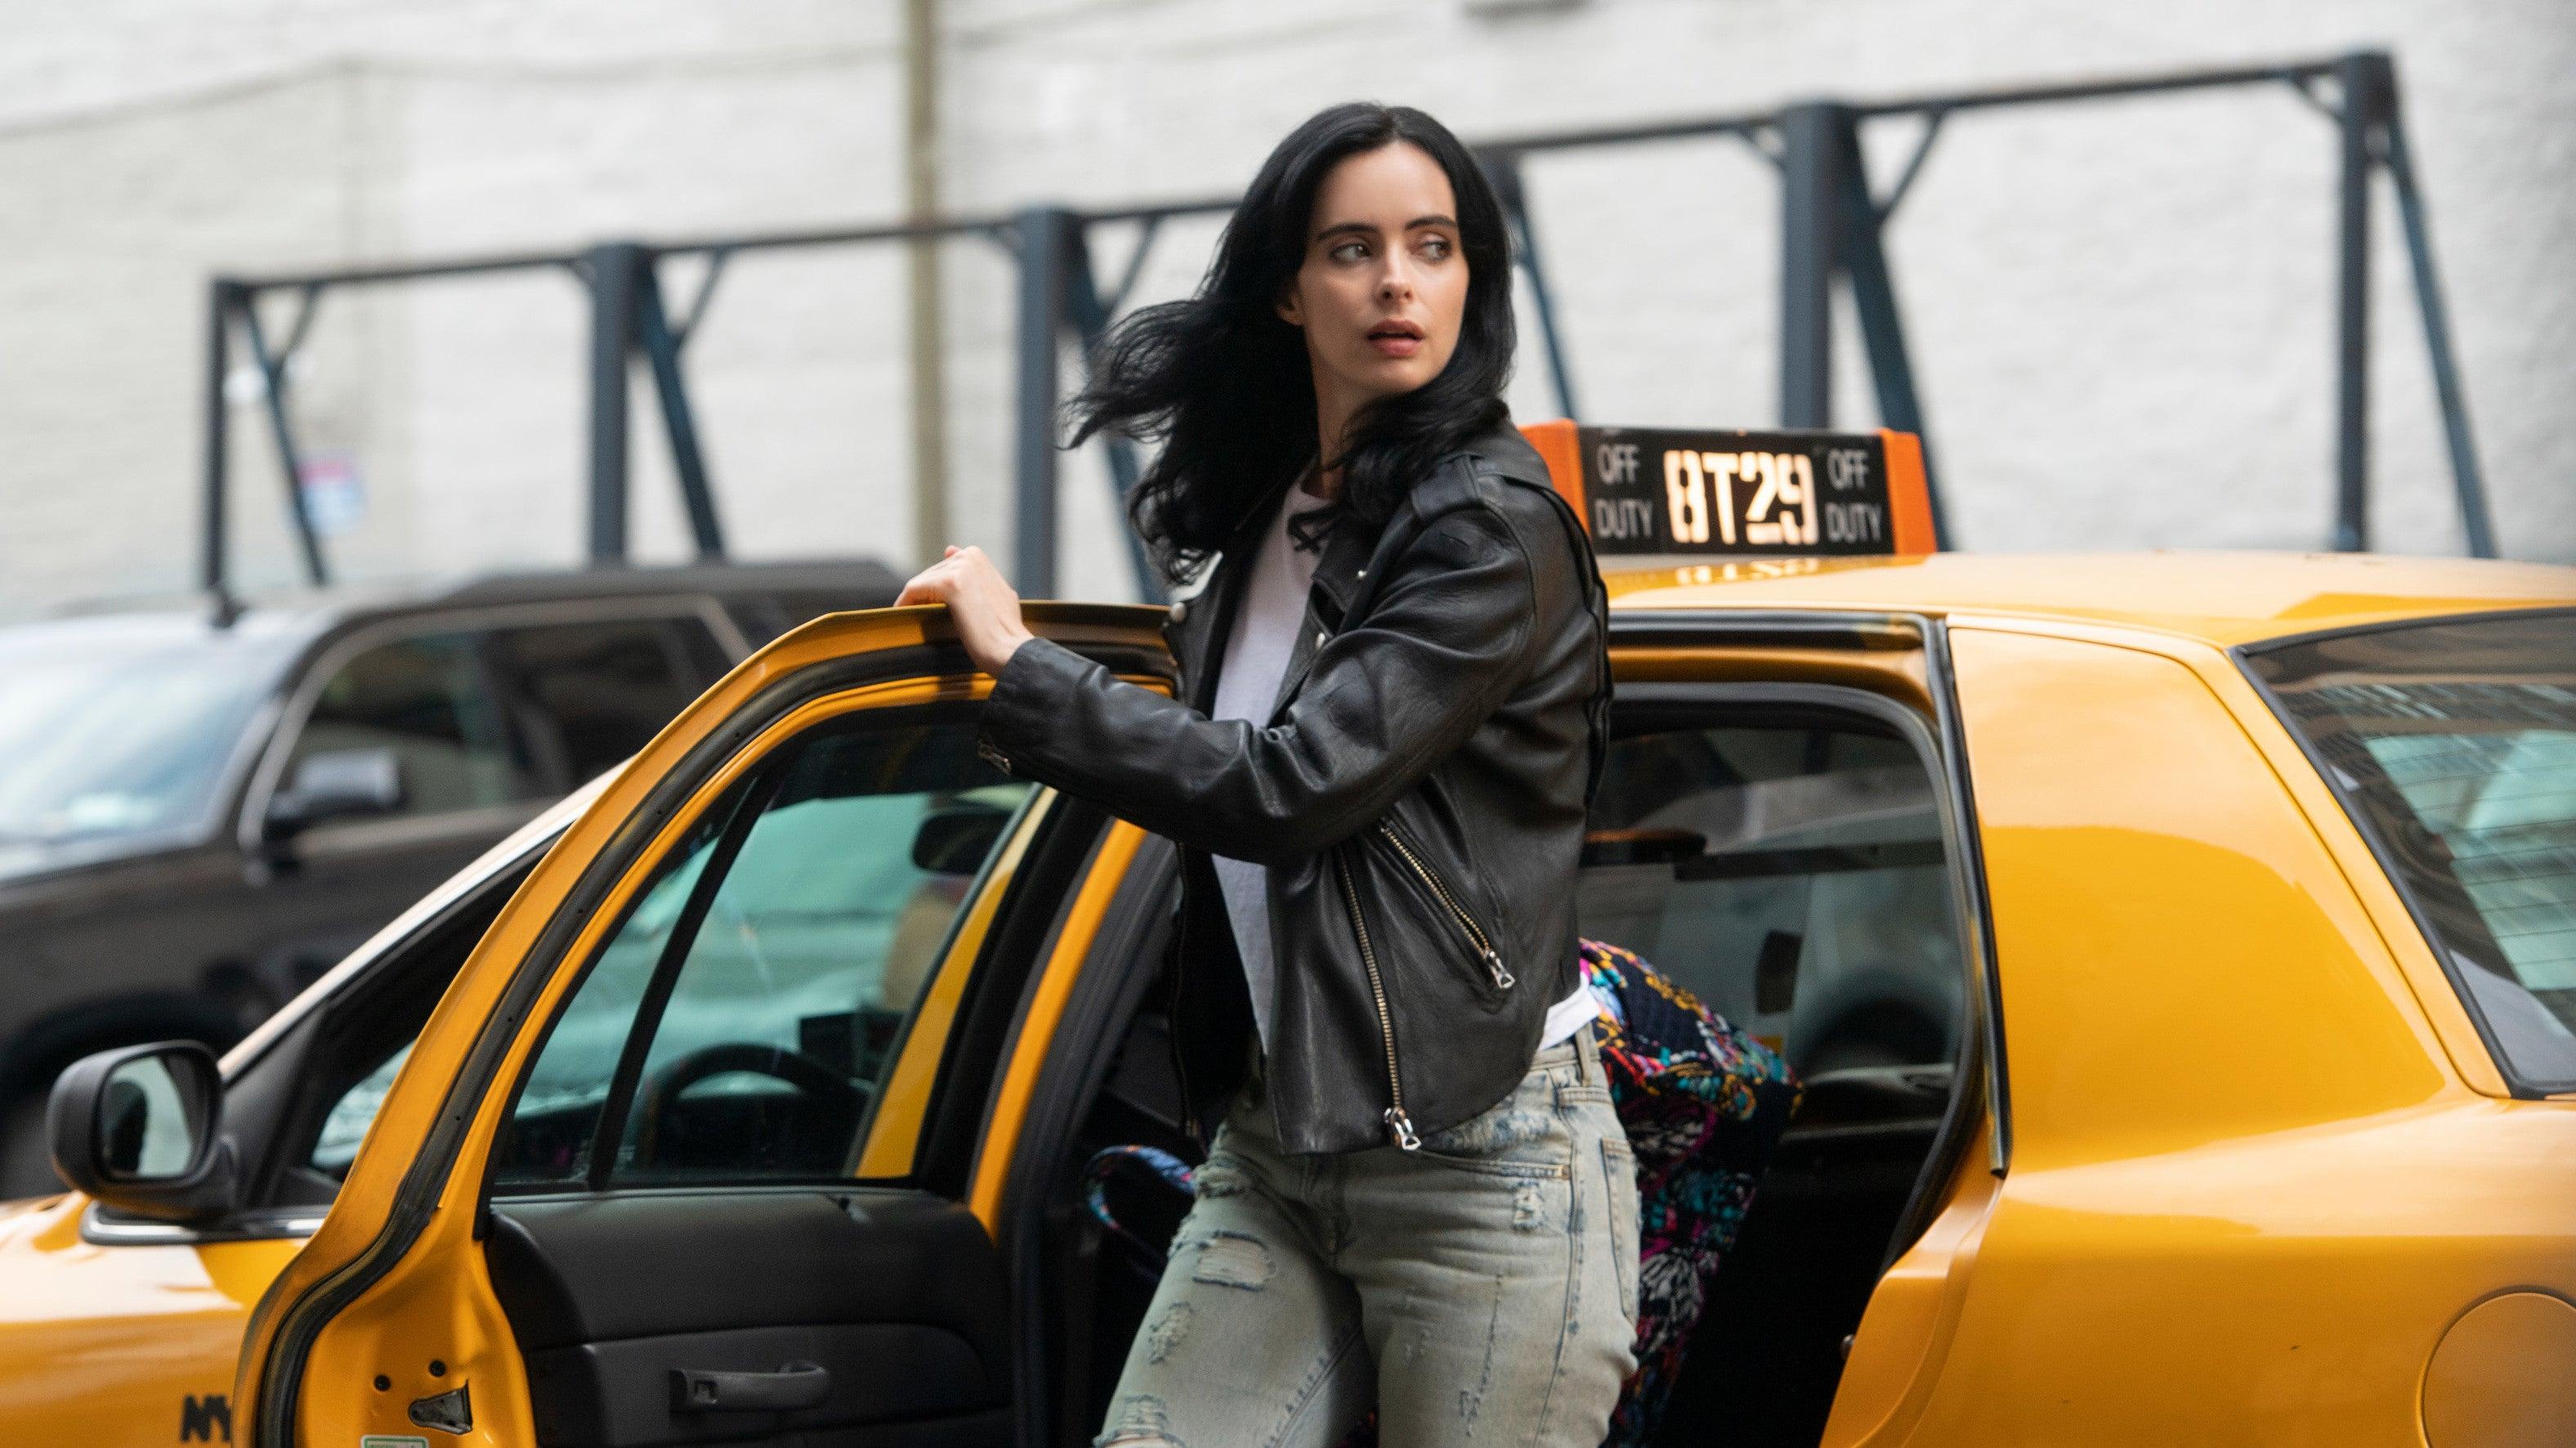 A New Jessica Jones Teaser Introduces The Final Season's Premiere Date And Villain